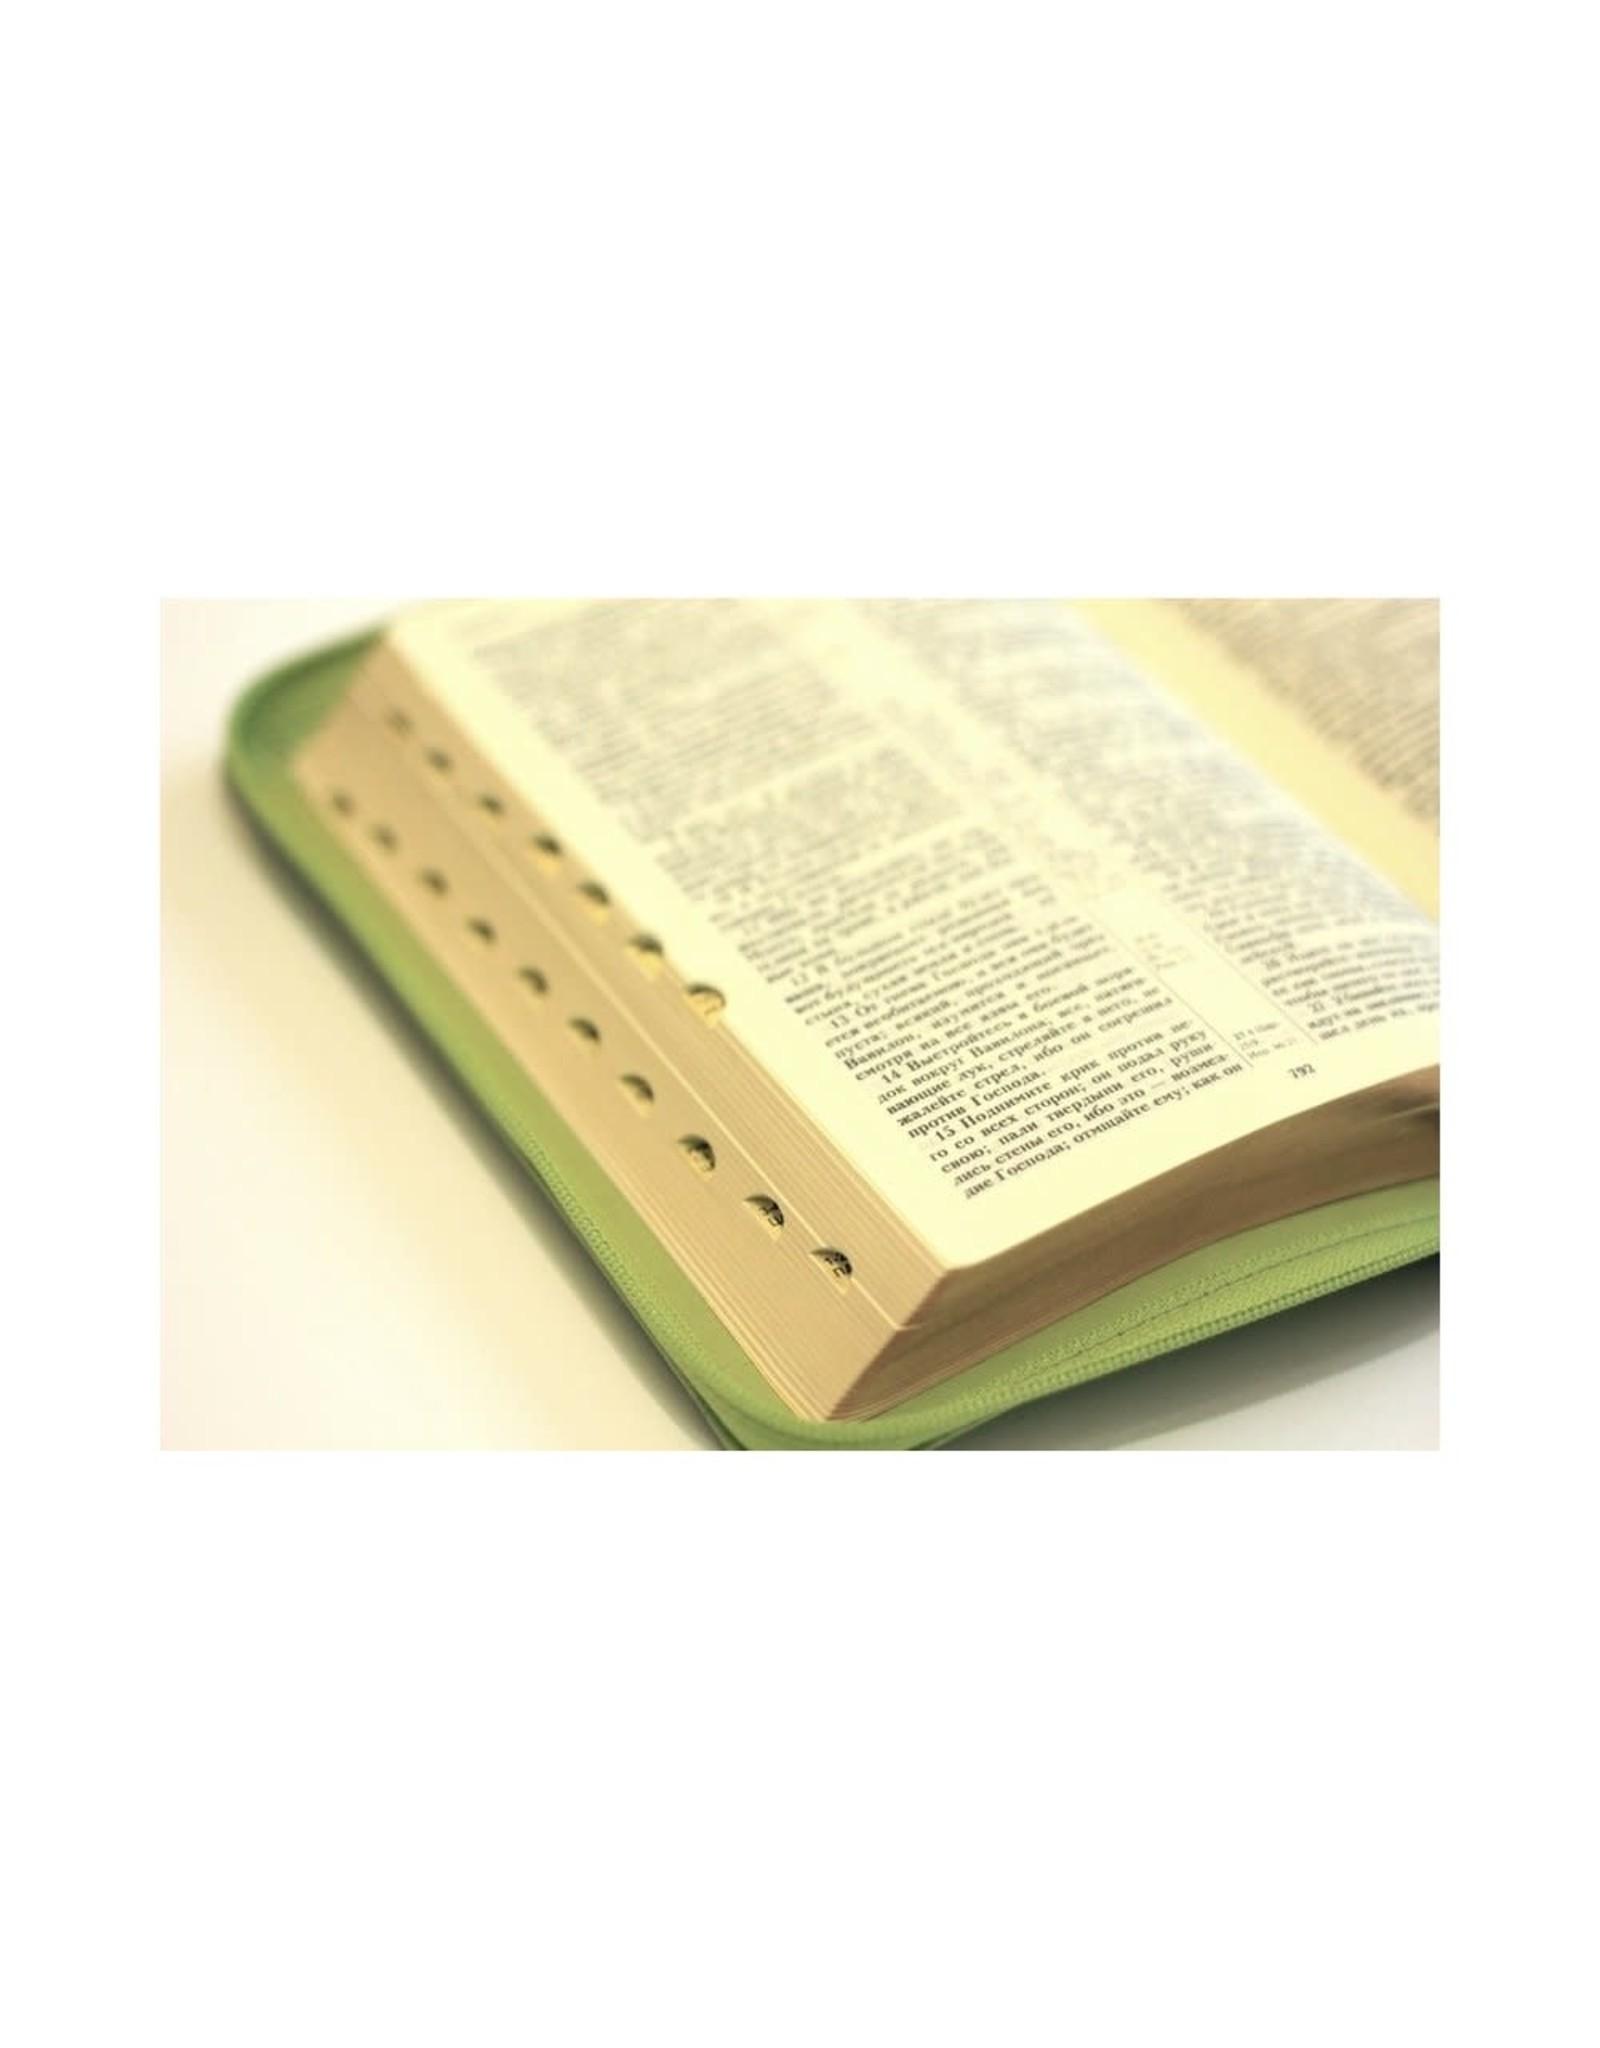 Библия, Каноническая (SYNO), Index, Leather, Small